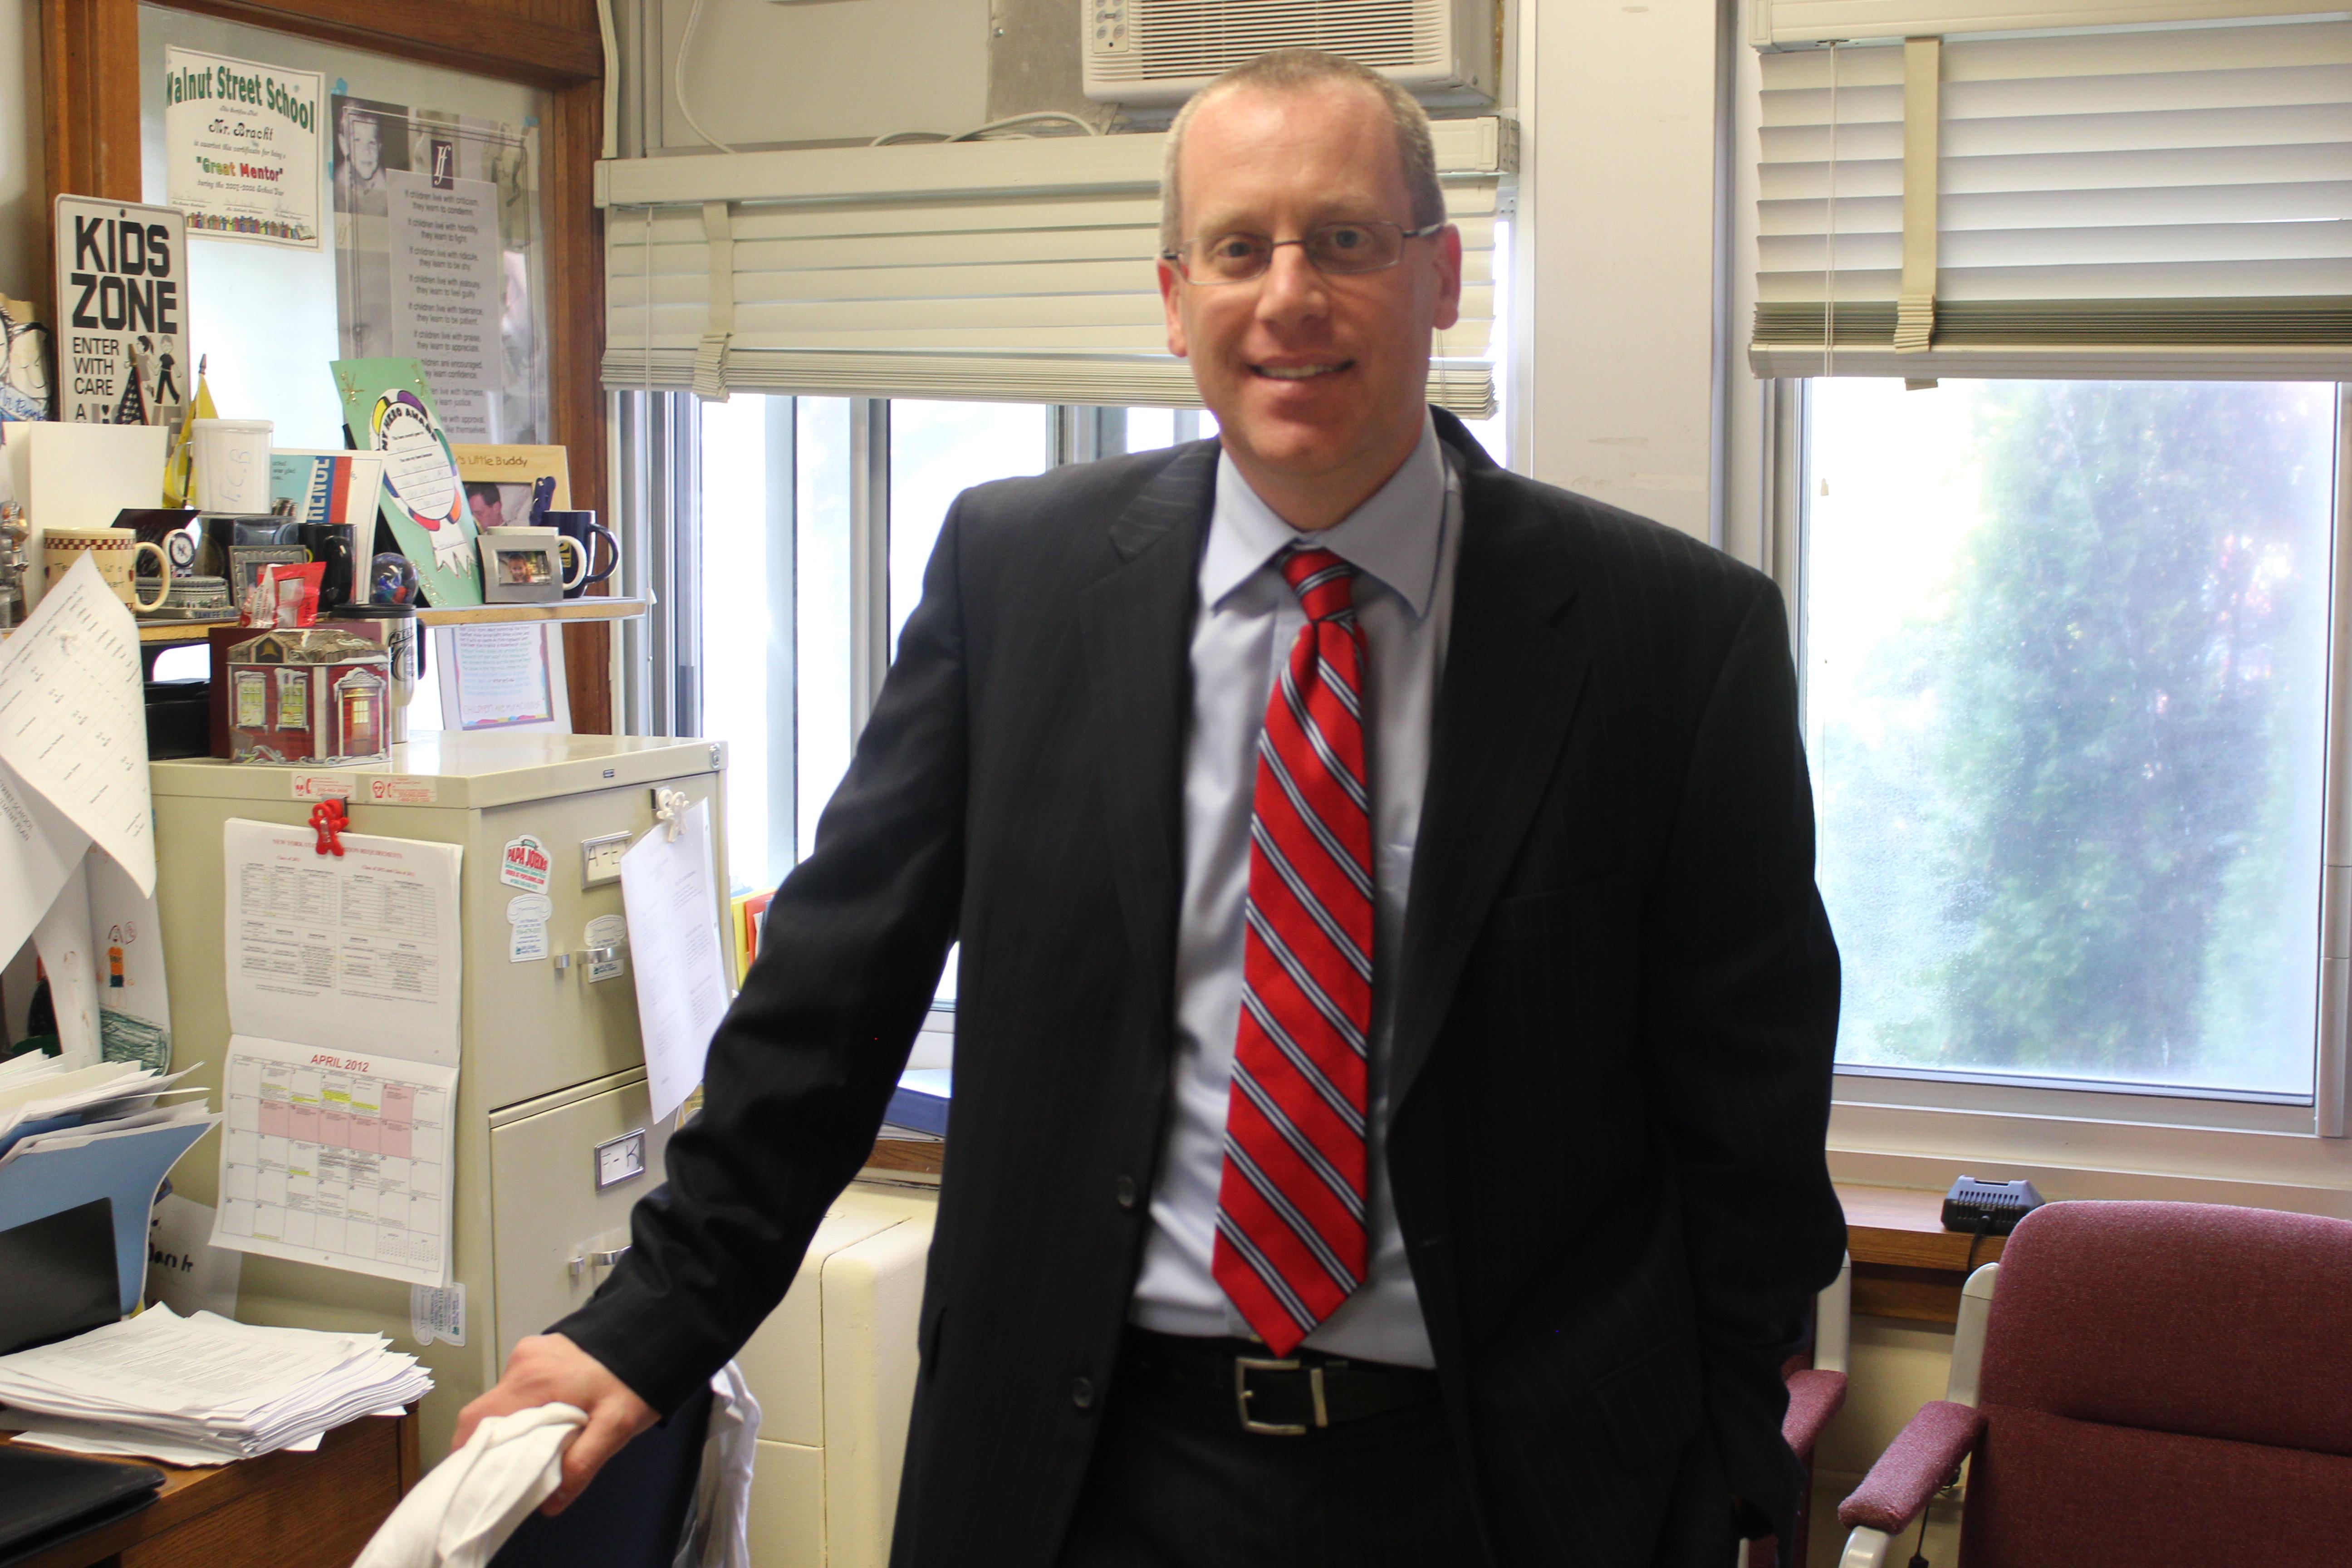 Mr. Kevin Bracht, Principal